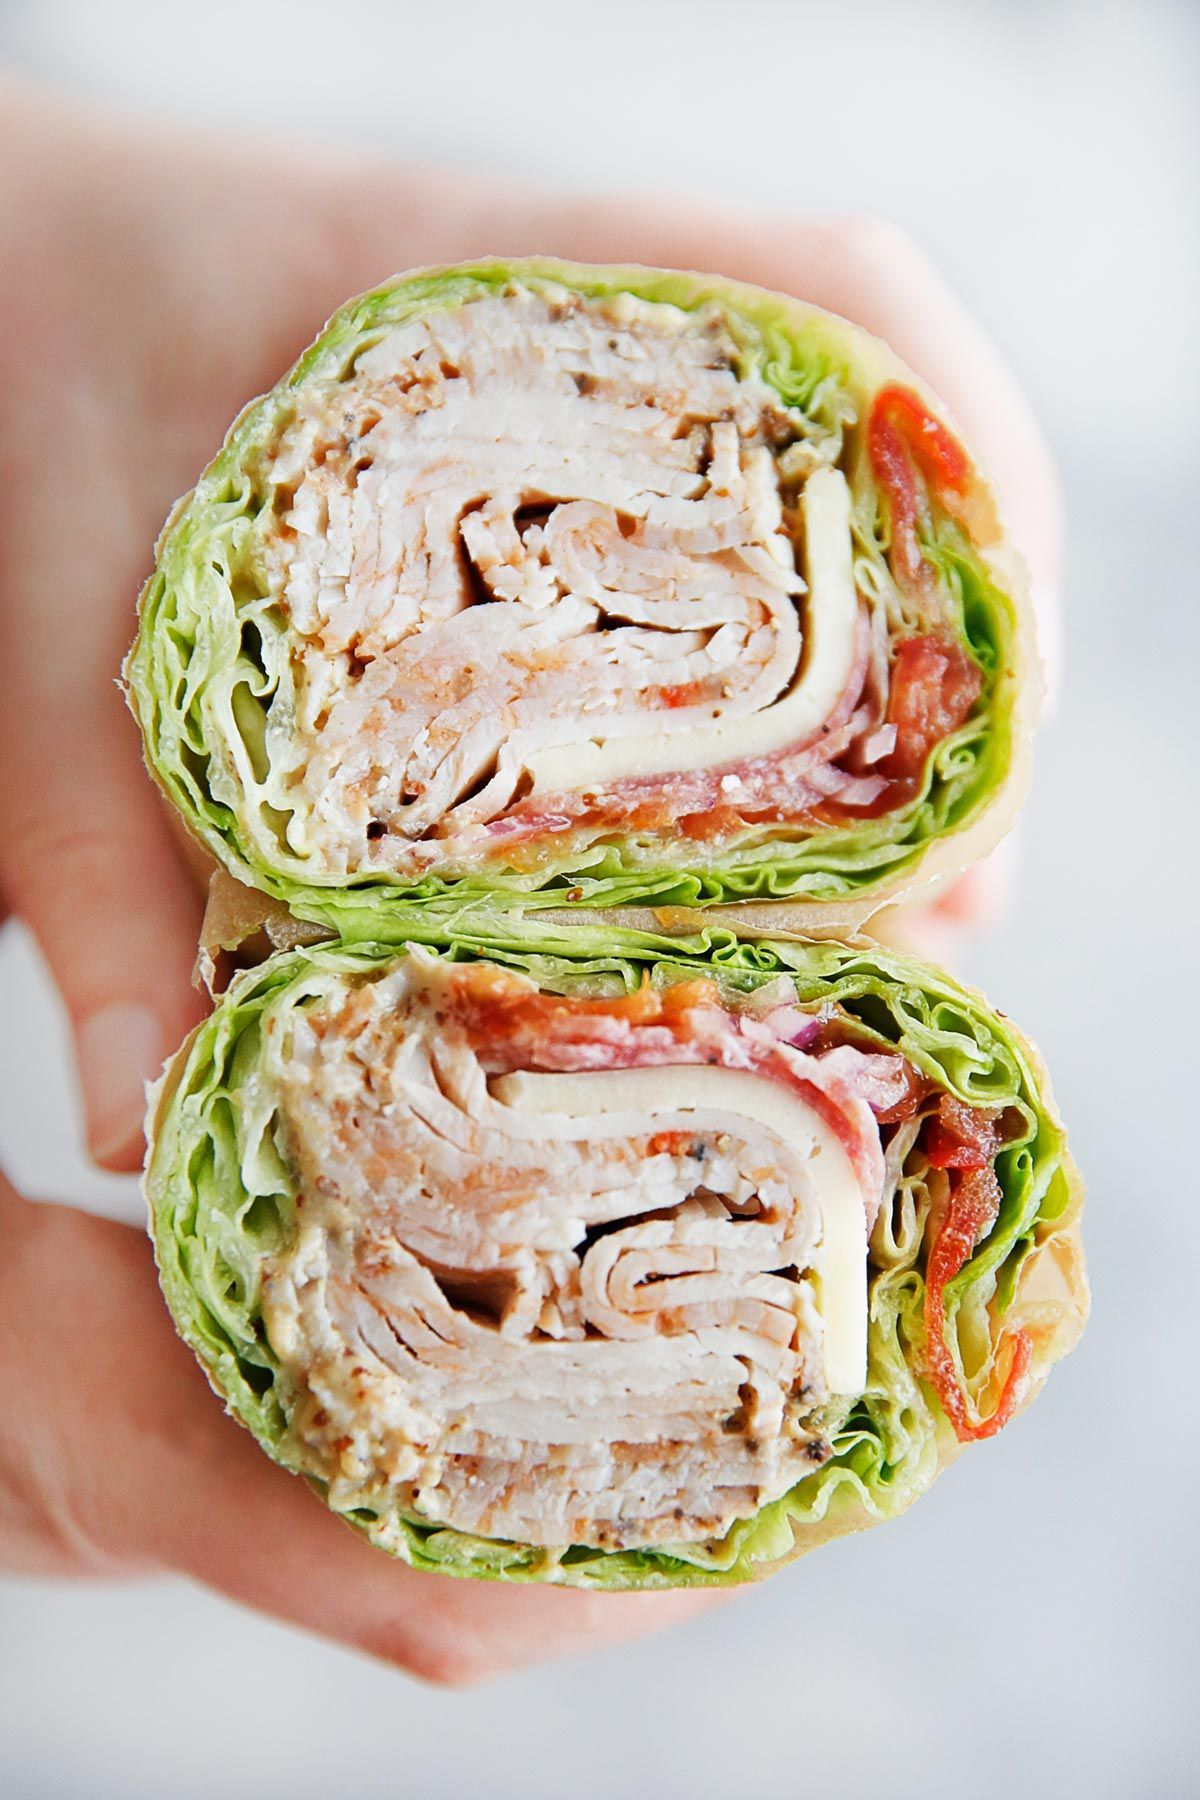 7 Sandwiches Recipes That Are Actually Keto #sandwichrecipes